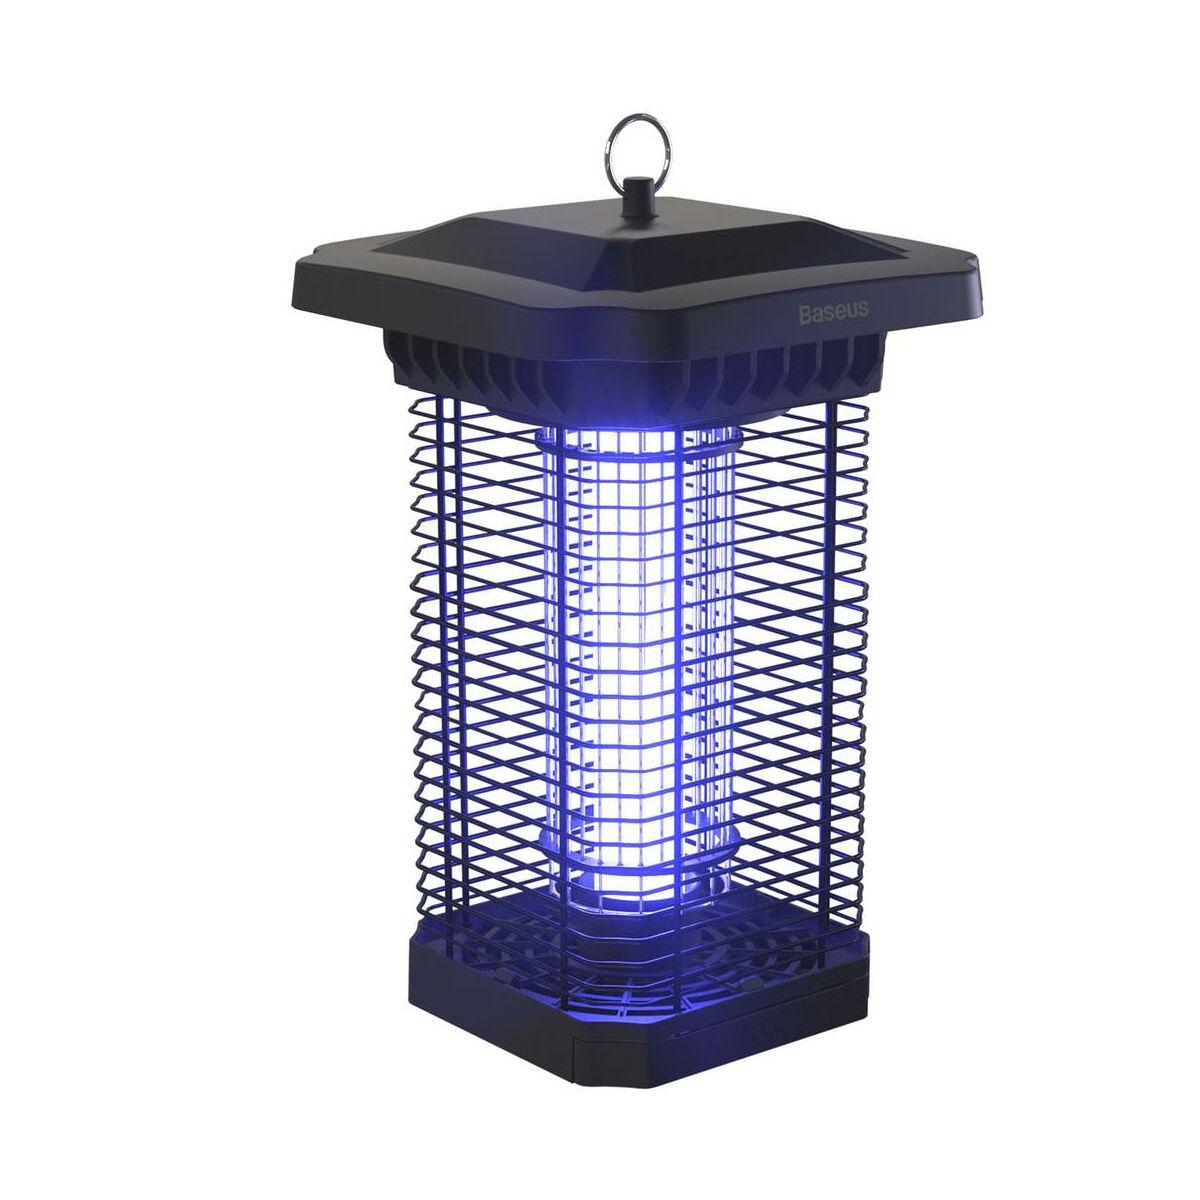 Baseus otthon, Pavilion Courtyard szúnyogirtó, UV fény 395nm, 18W, fekete (ACMWD-TB01)